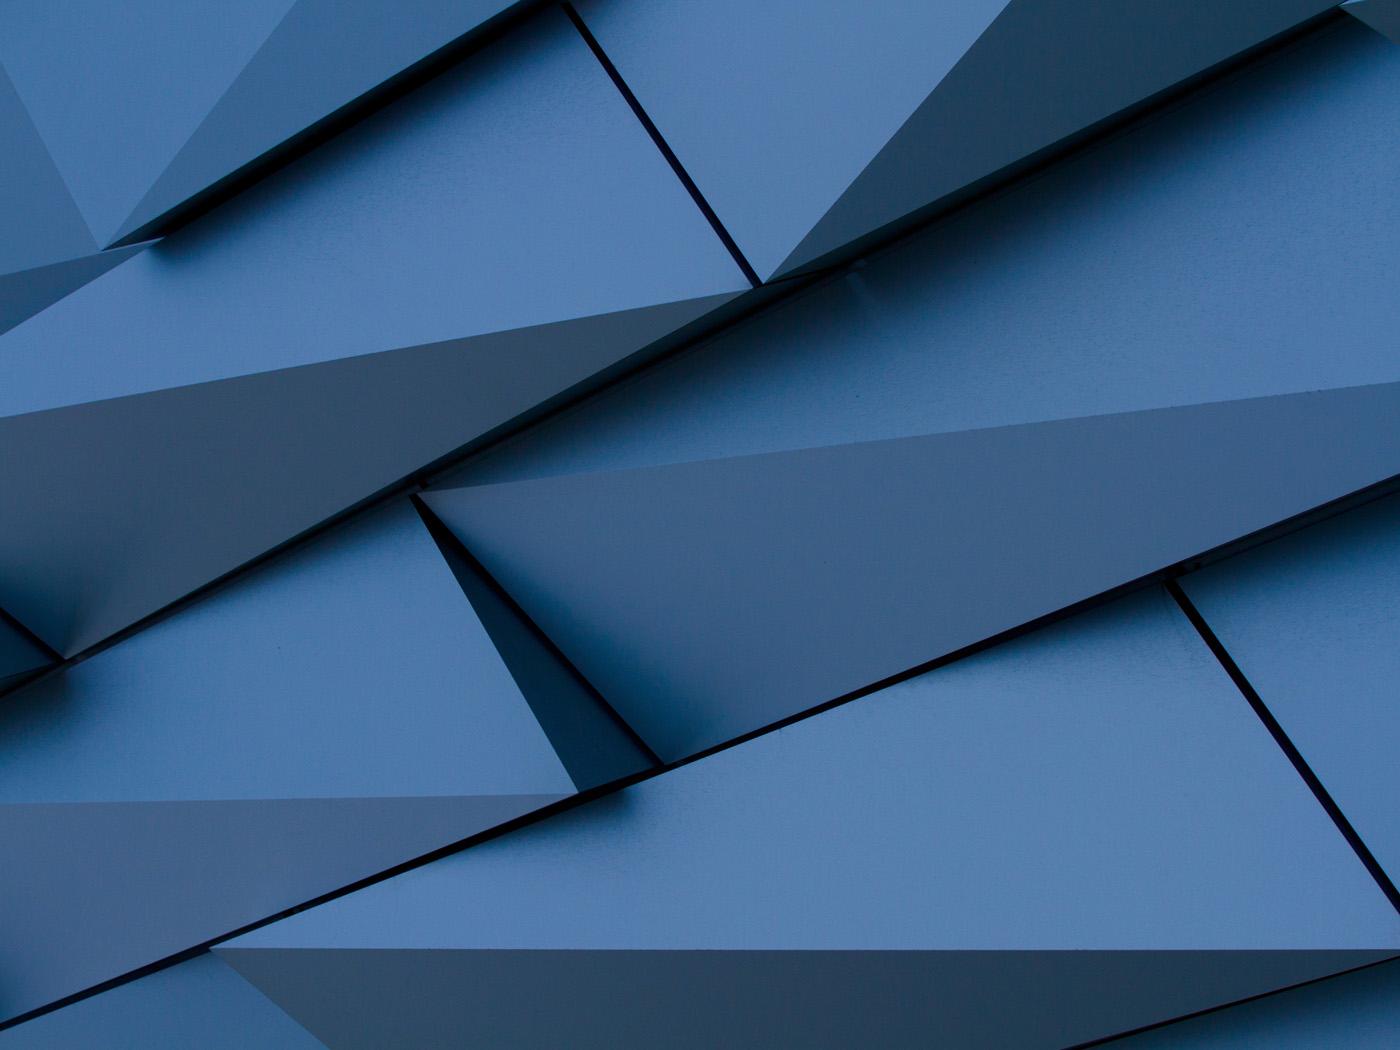 SRTS_Triangles_Tom Dalzell.jpg